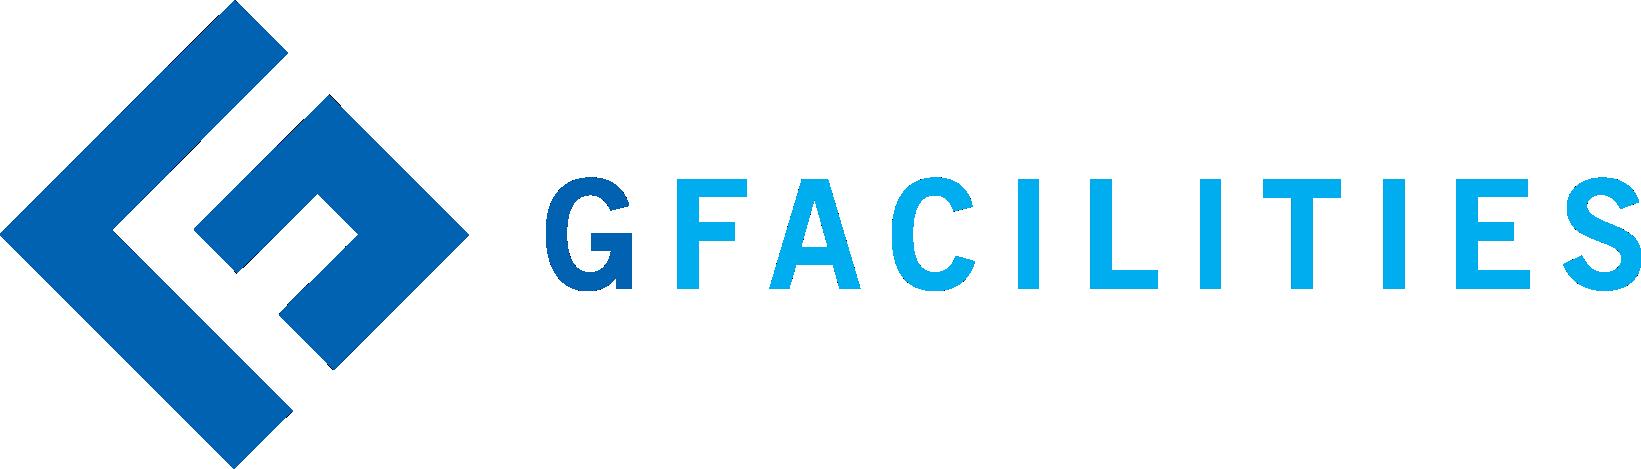 GFacilities